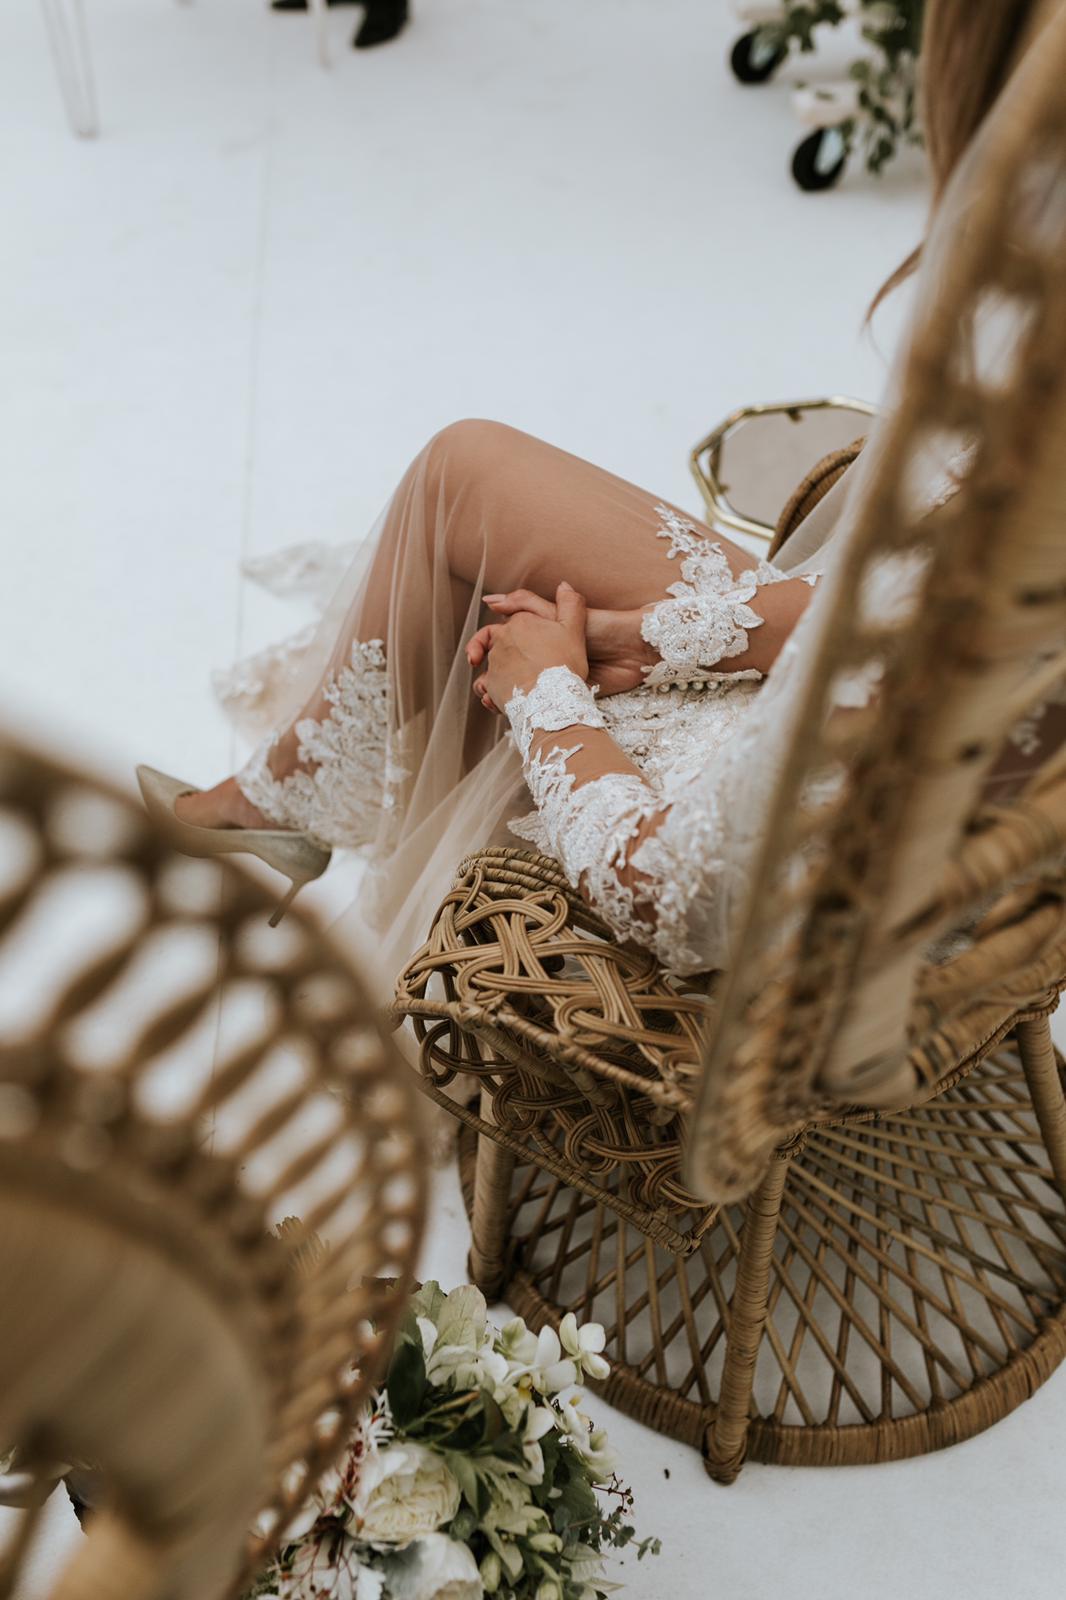 #apbloem #florist #bloemist #weddinggown #trouwjurk #amsterdam #bloemenwinkel #kerkstraat #bloemen #flowers #weddingstyling #bruiloft #trouwen #liefde #bride #wedding #marriage #bruidsboeket #floraldesign #mordernwedding #modernbride #greenhouse #kas #planten #styling #interiorstyling #white #wit